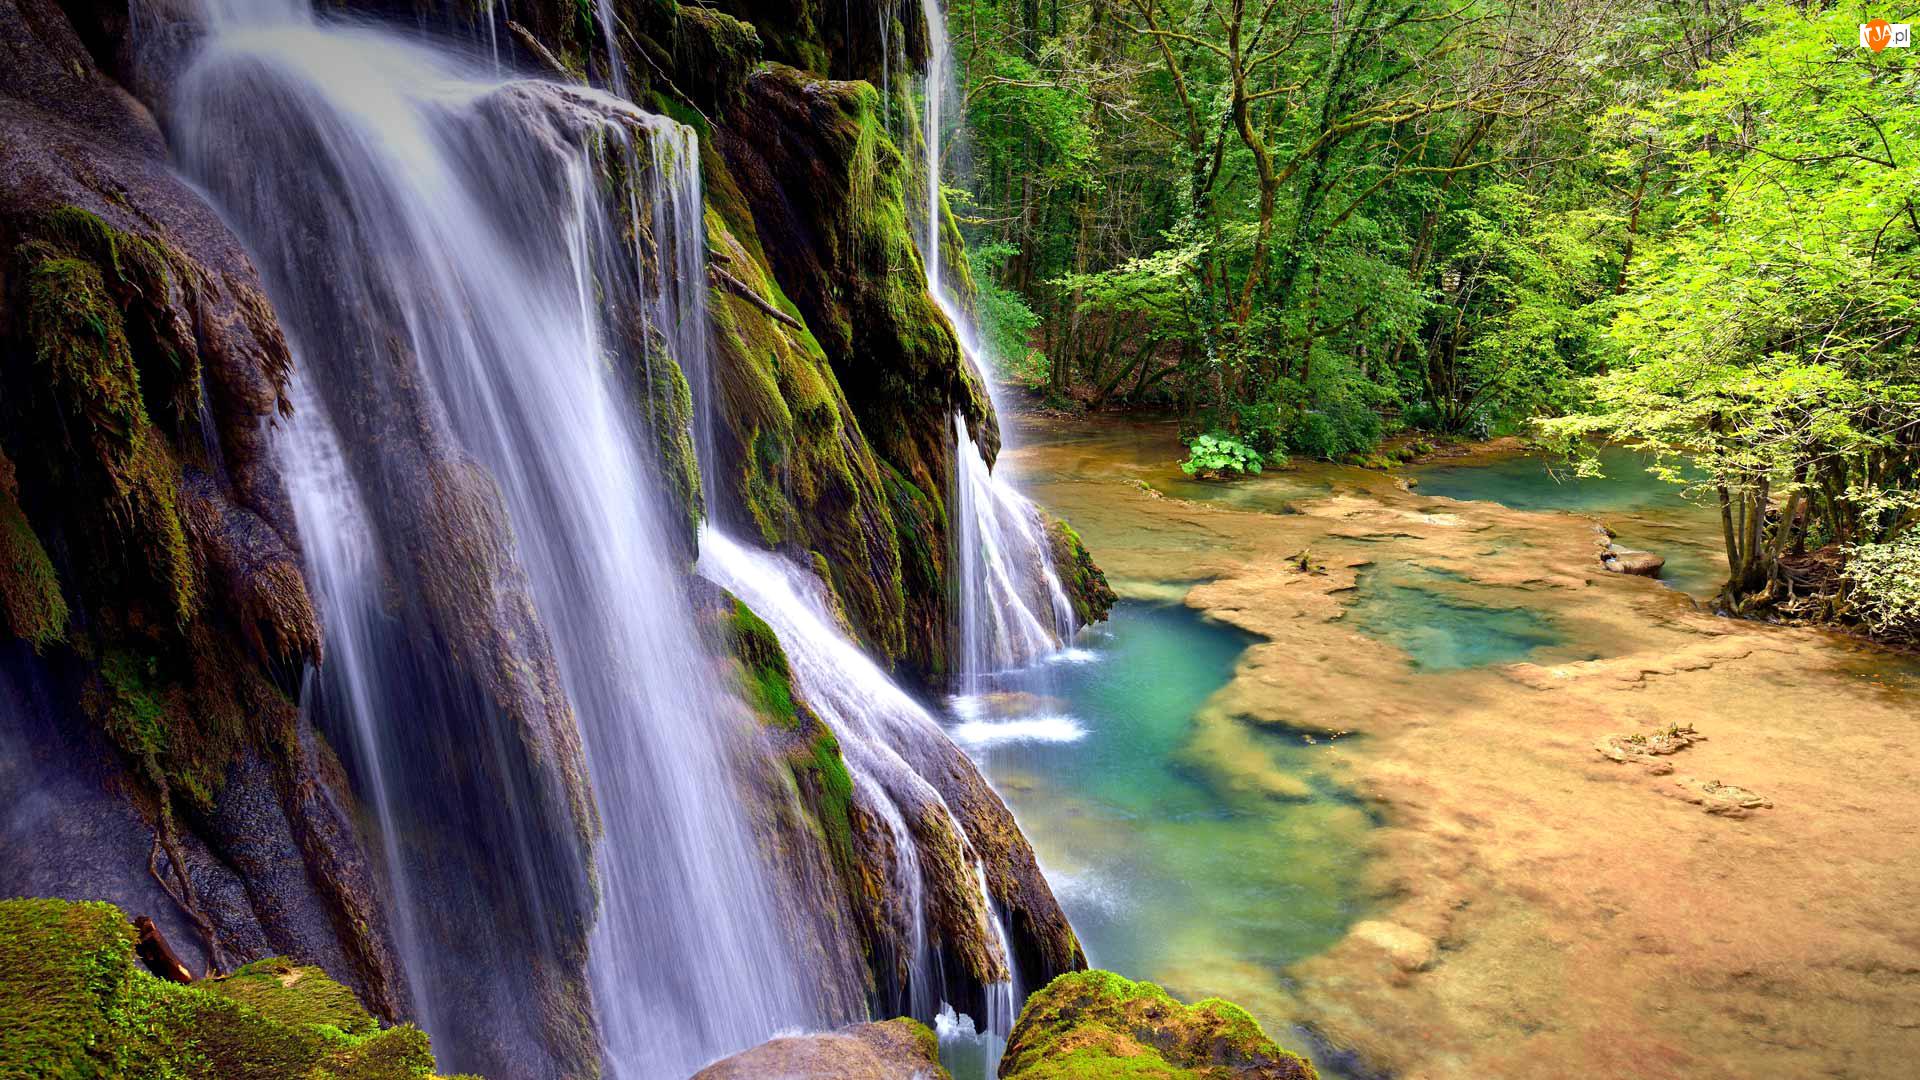 Francja, Drzewa, Region Franche-Comté, Wodospad